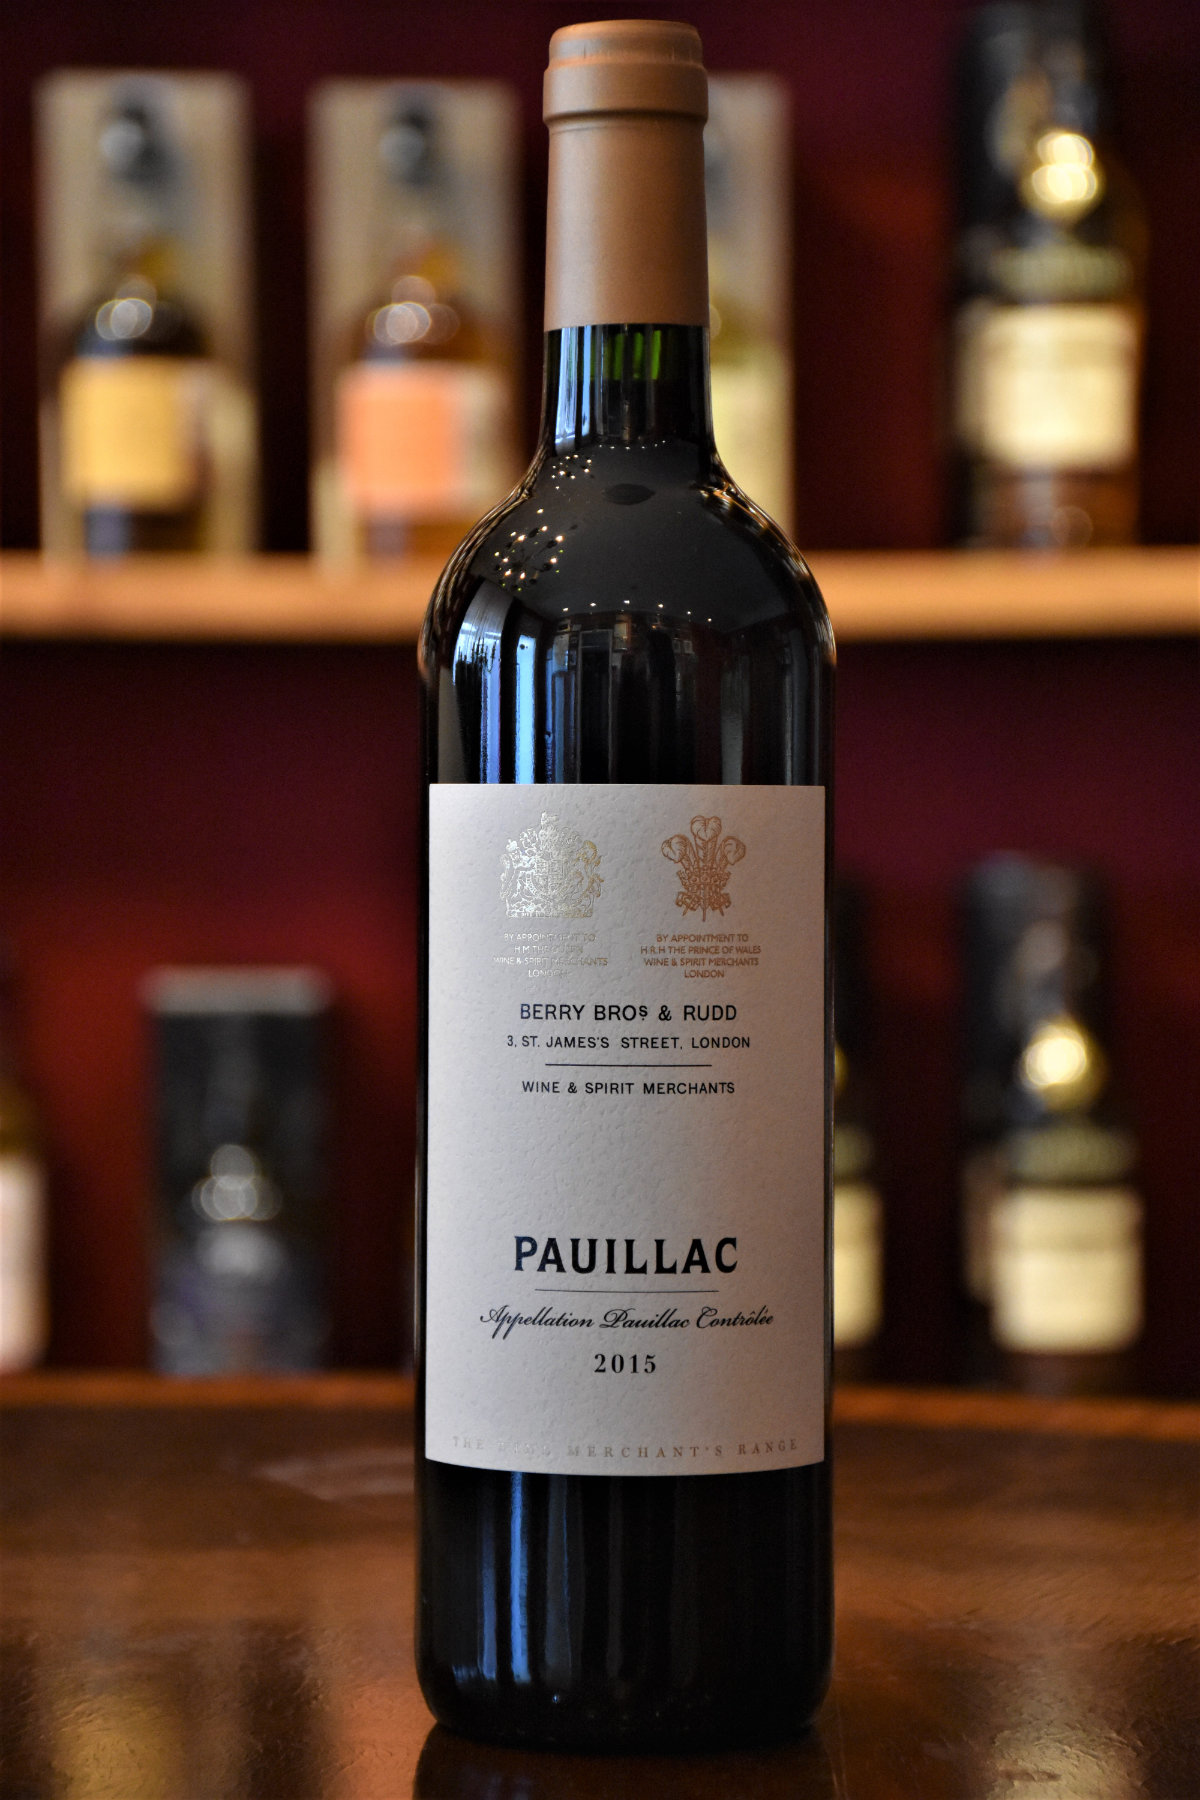 Pauillac Domaines Francois-Xavier Borie, 13 % Alc.Vol., 2015,  Berry Bros. & Rudd